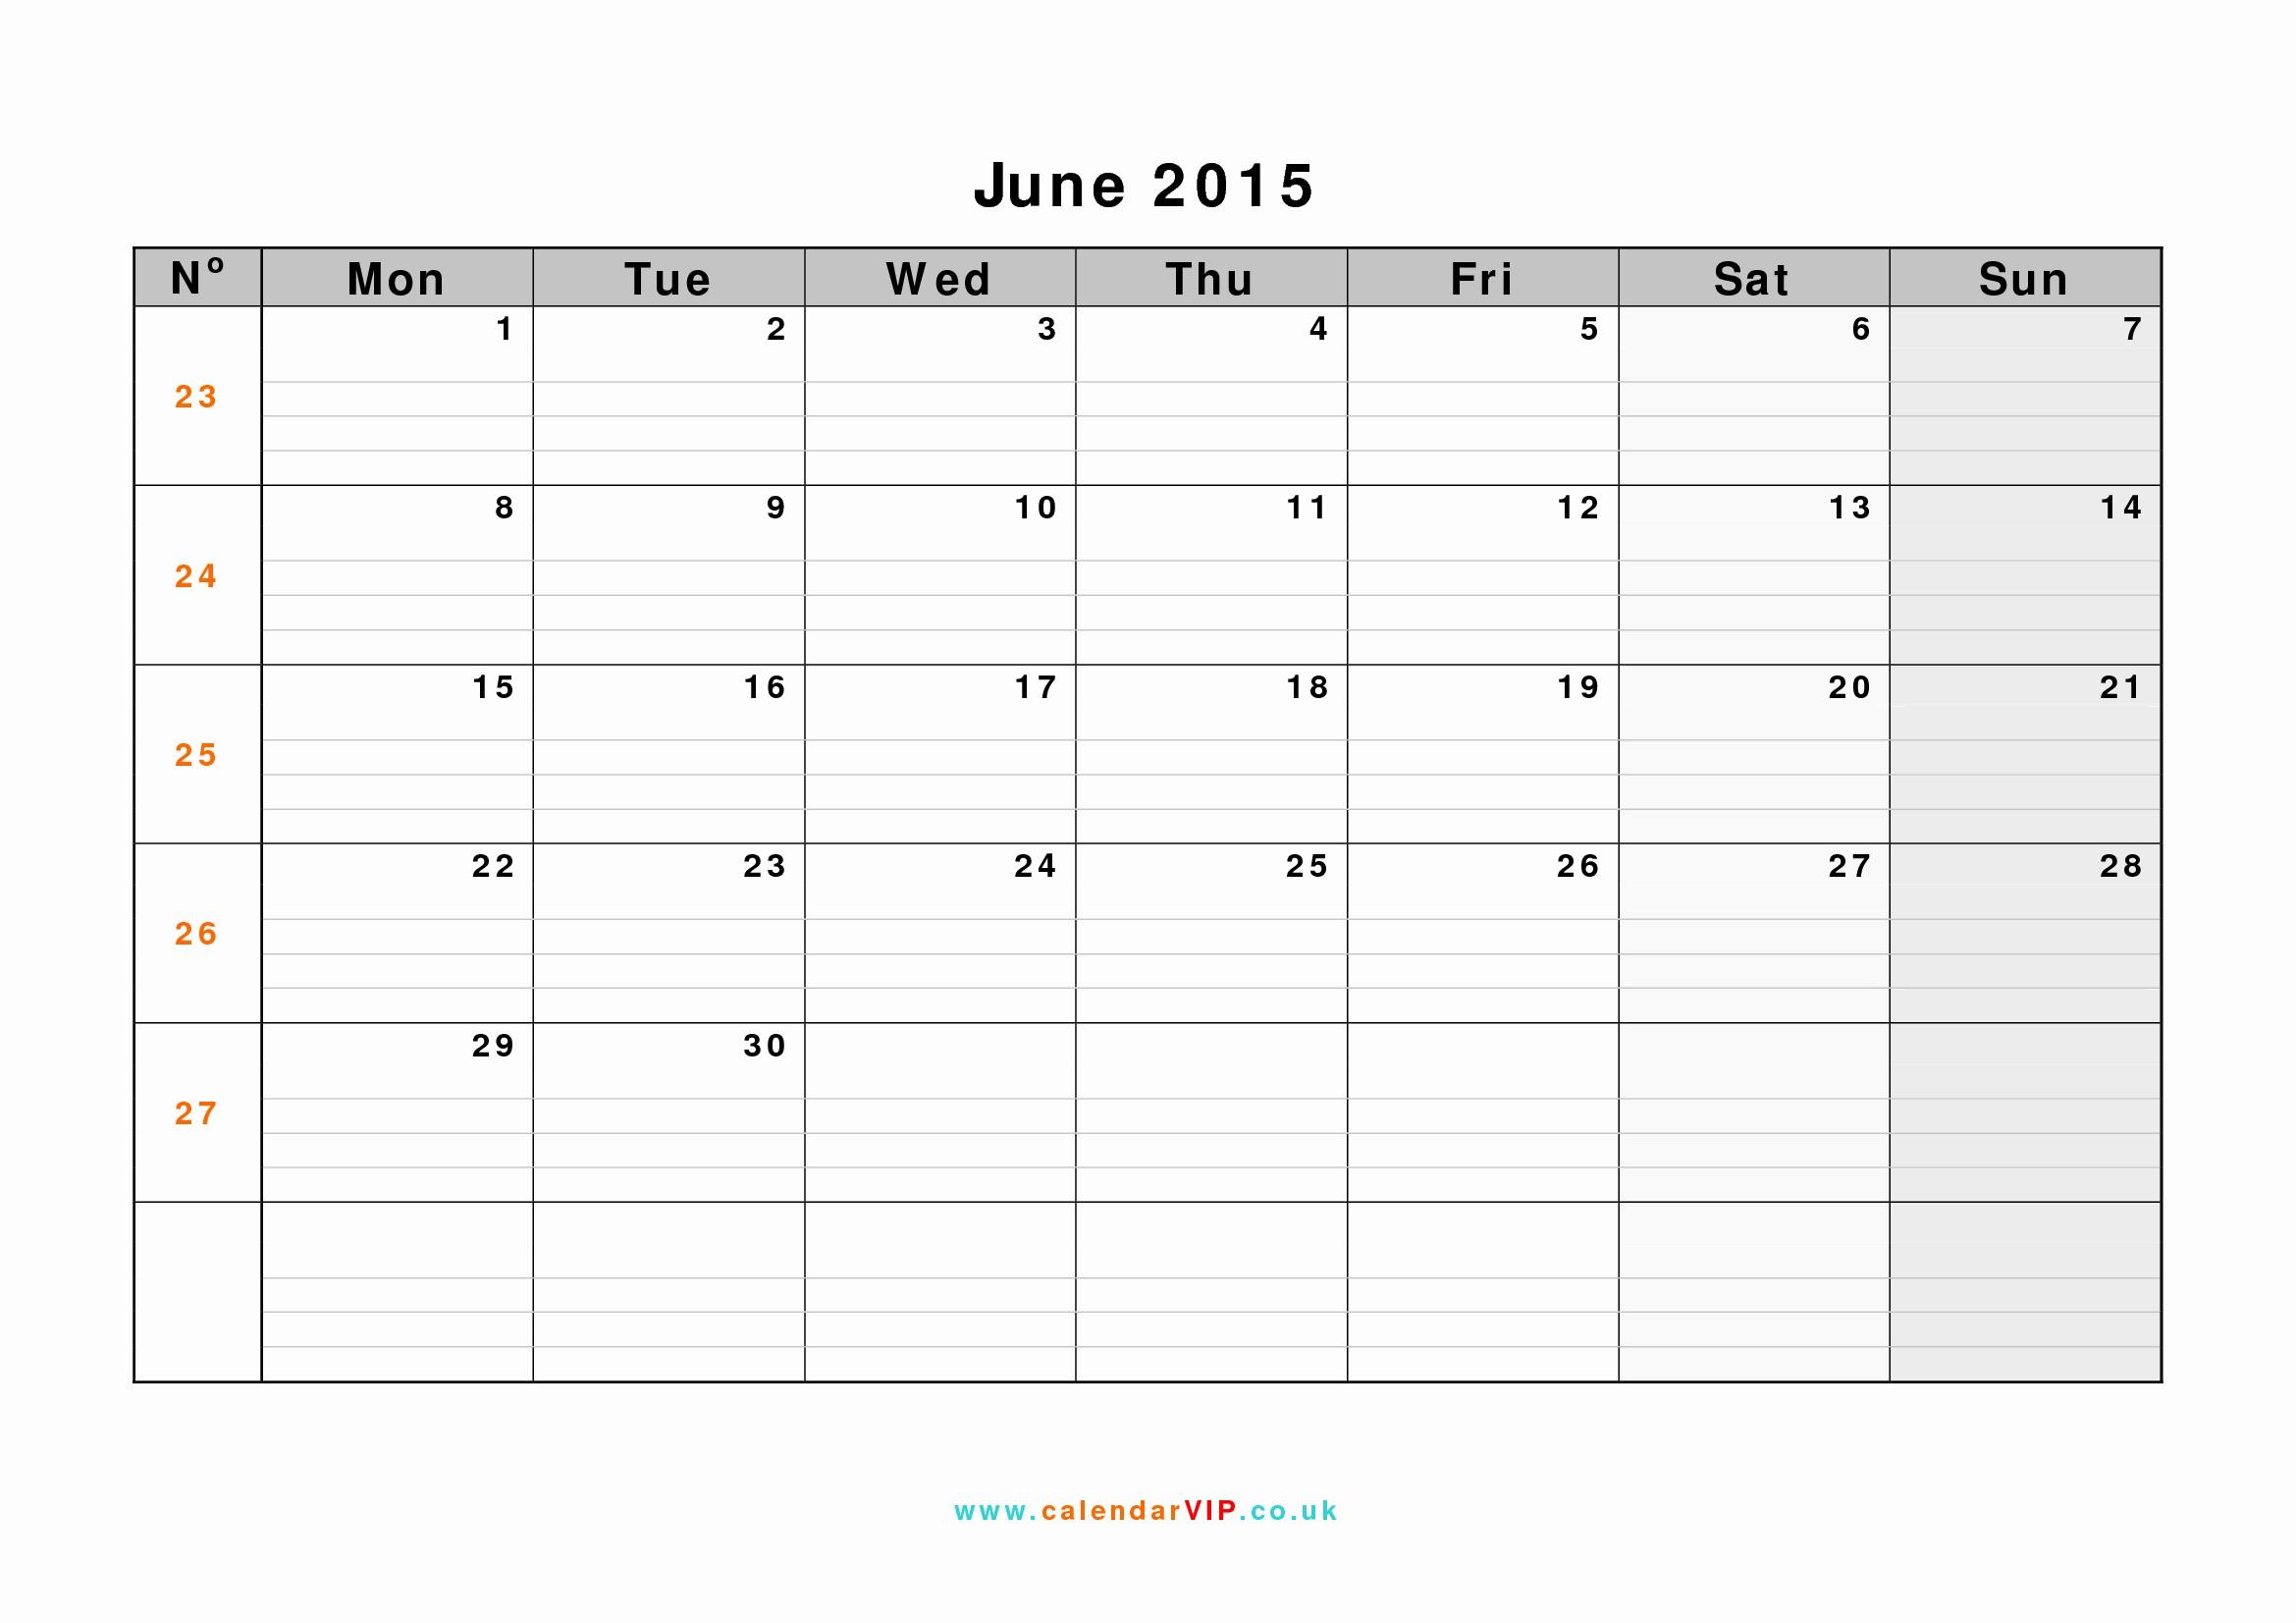 Calendar Template for June 2015 Fresh June 2015 Calendar Free Monthly Calendar Templates for Uk